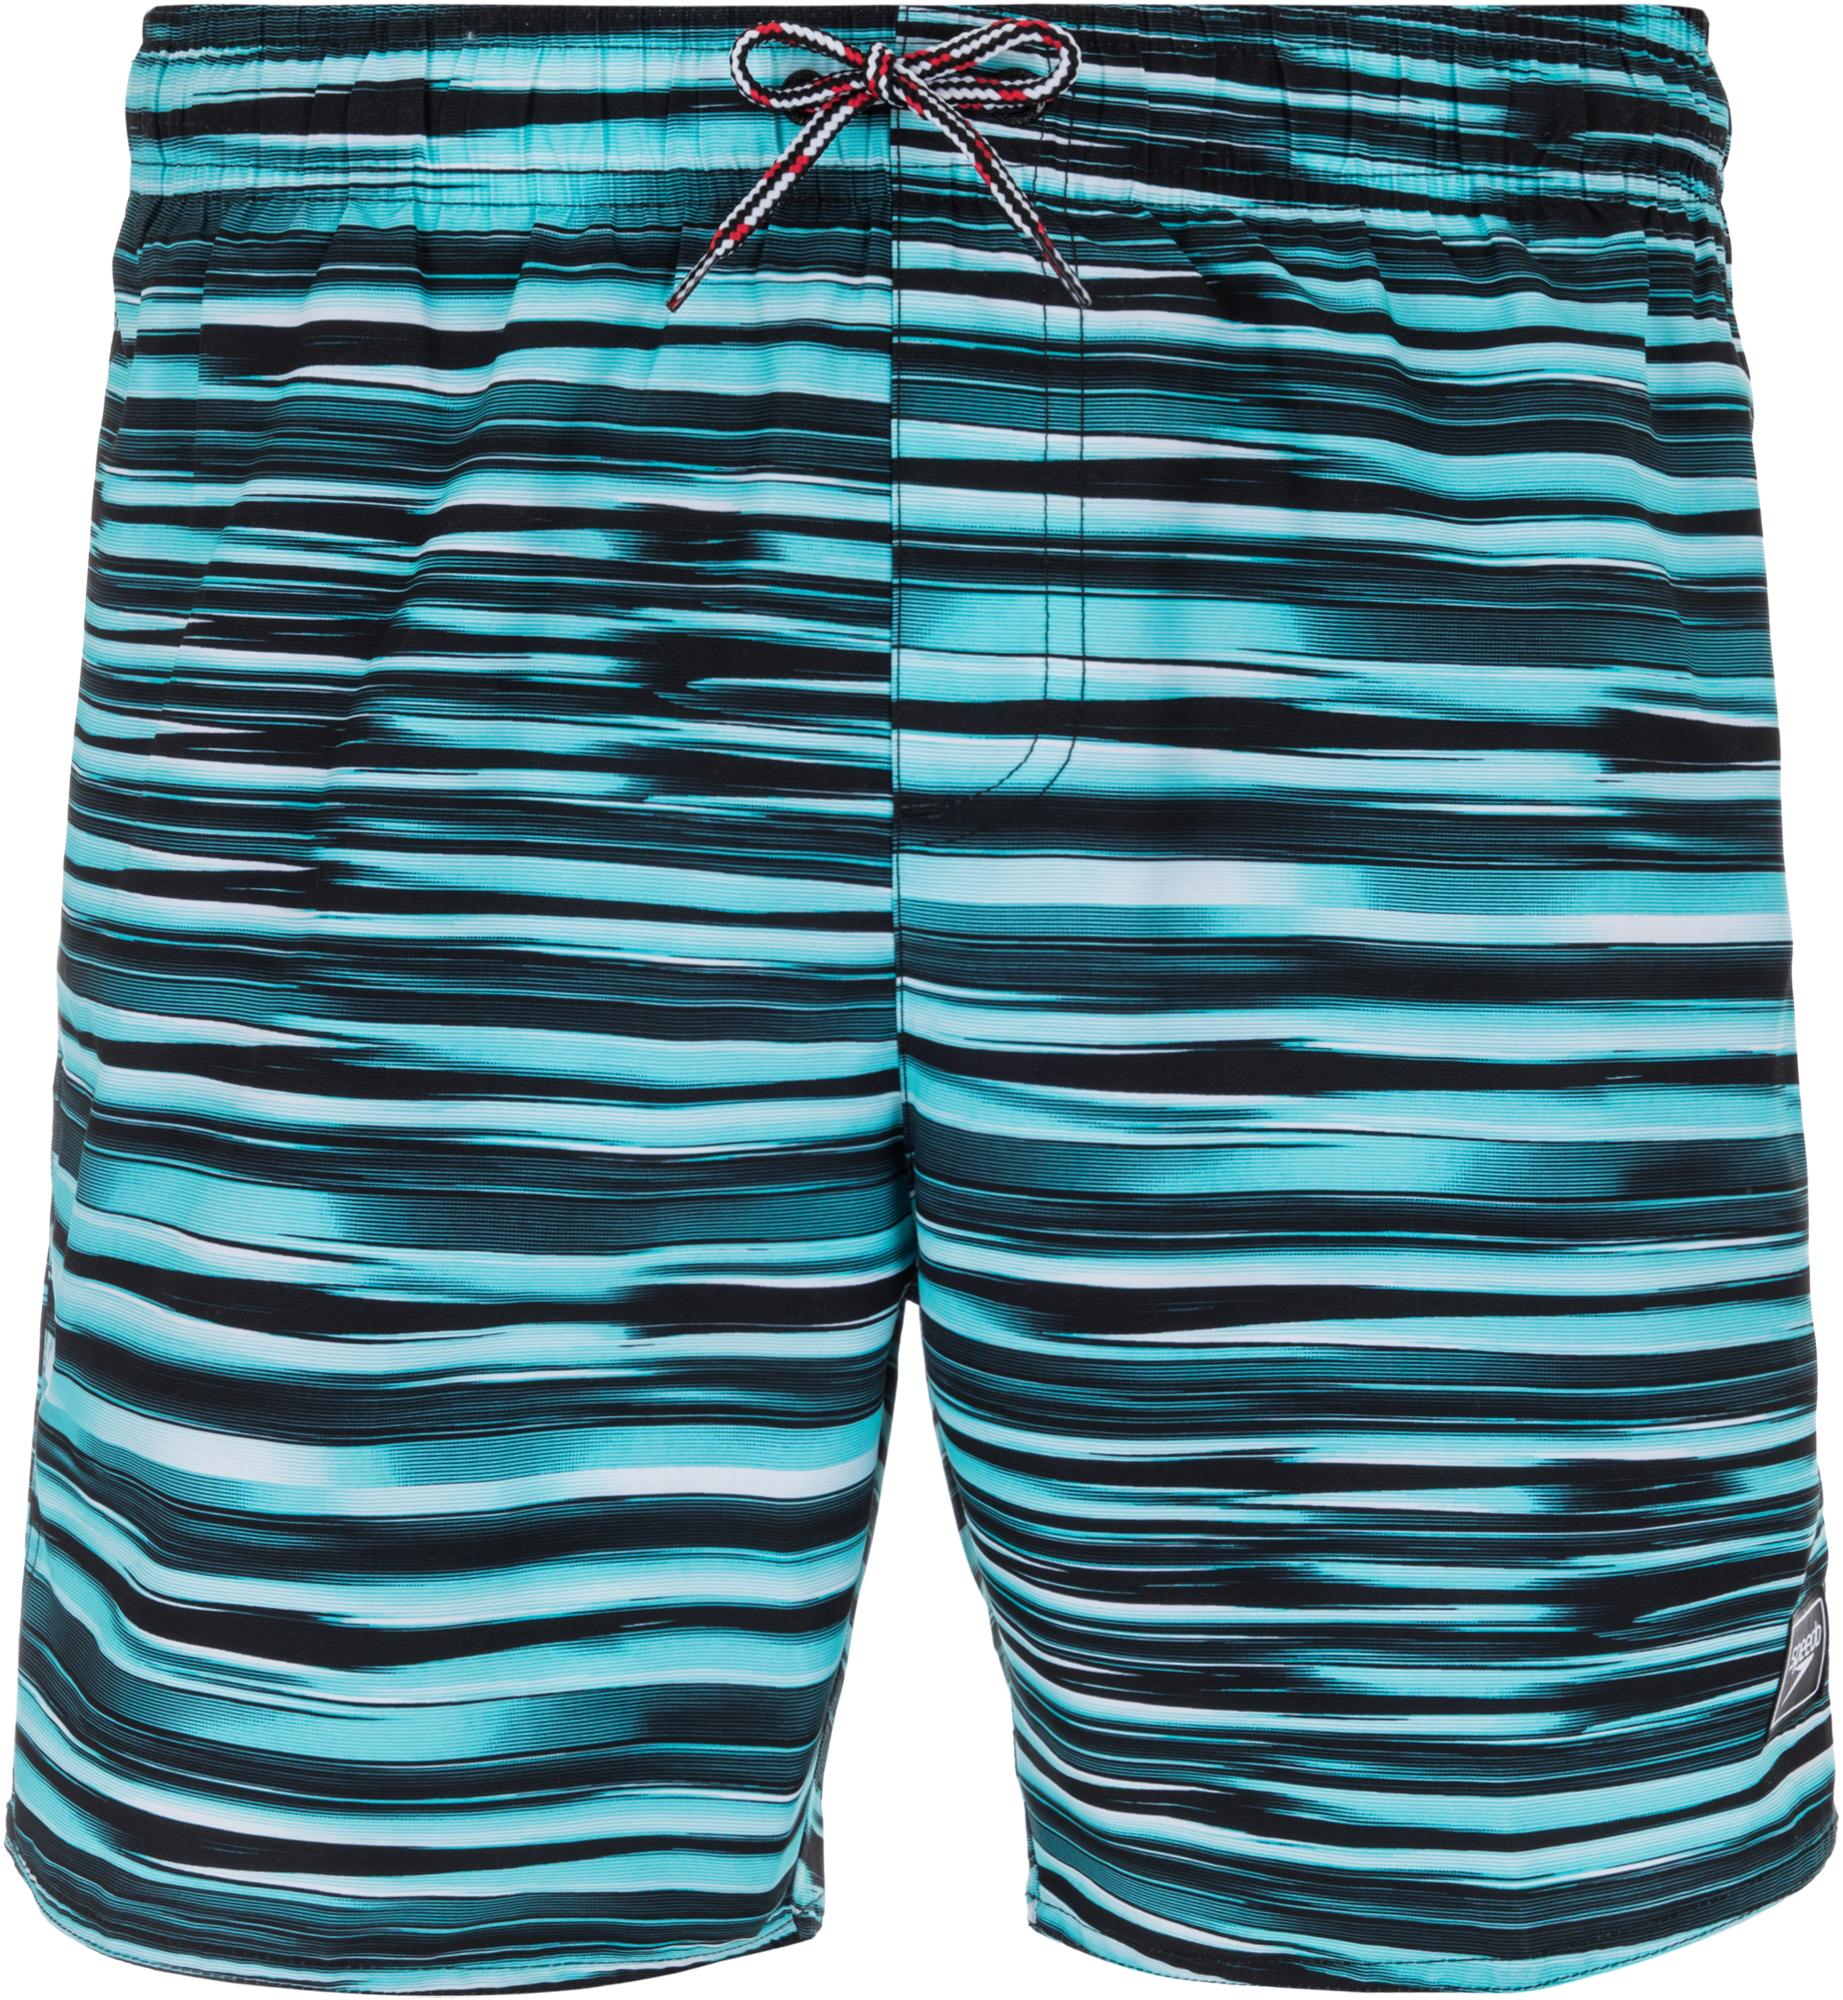 Speedo Шорты плавательные мужские Speedo Prt Leis 16, размер 54-56